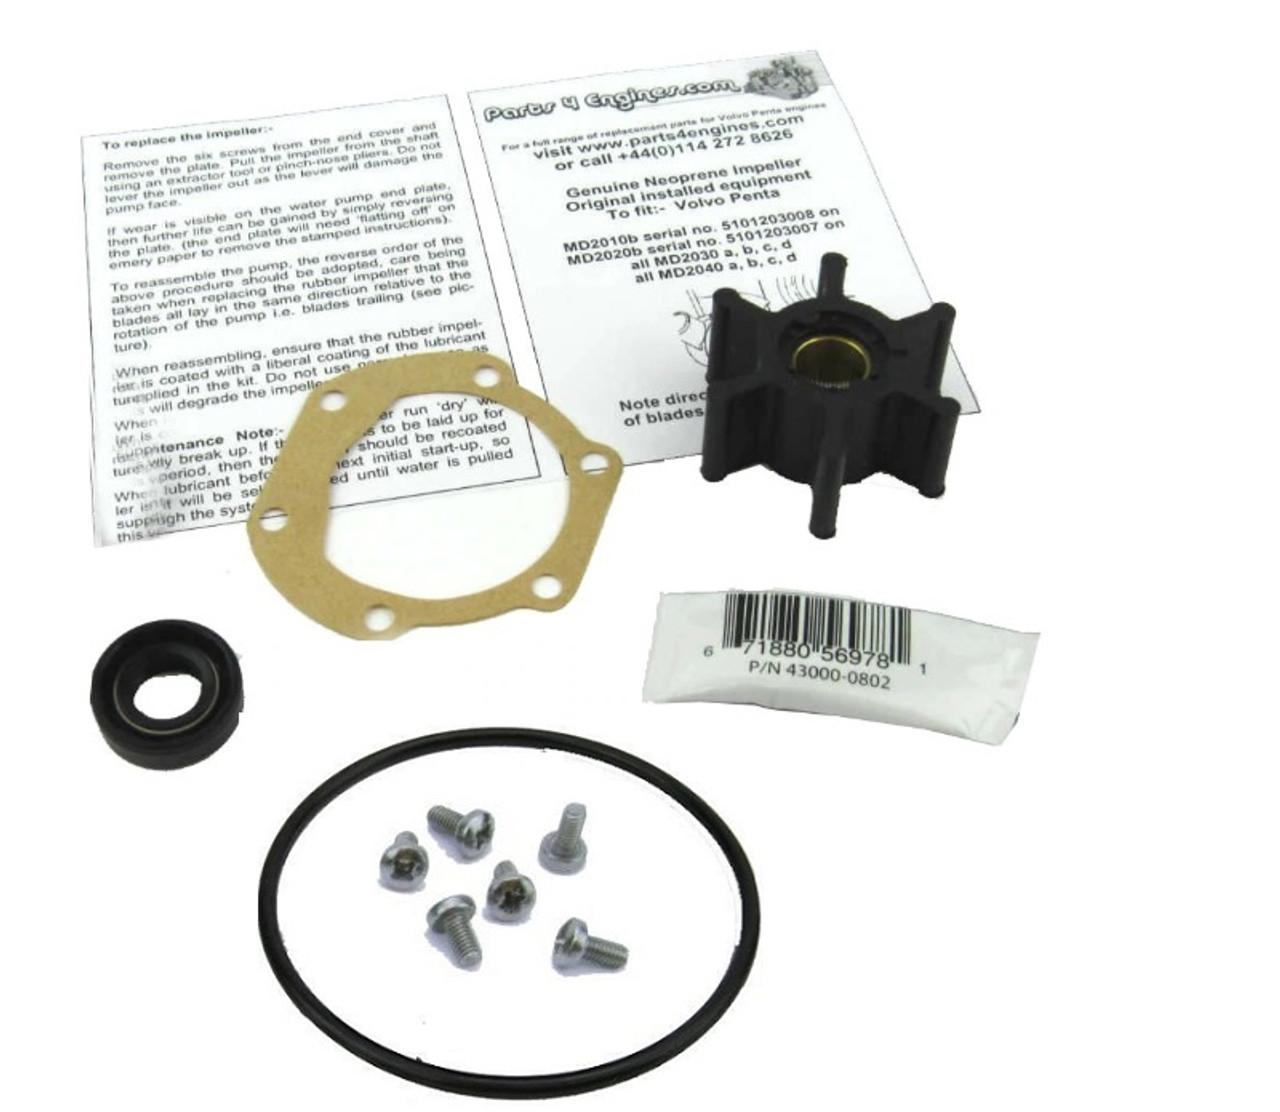 Volvo Penta D2-40 Raw water pump service kit - parts4engines.com